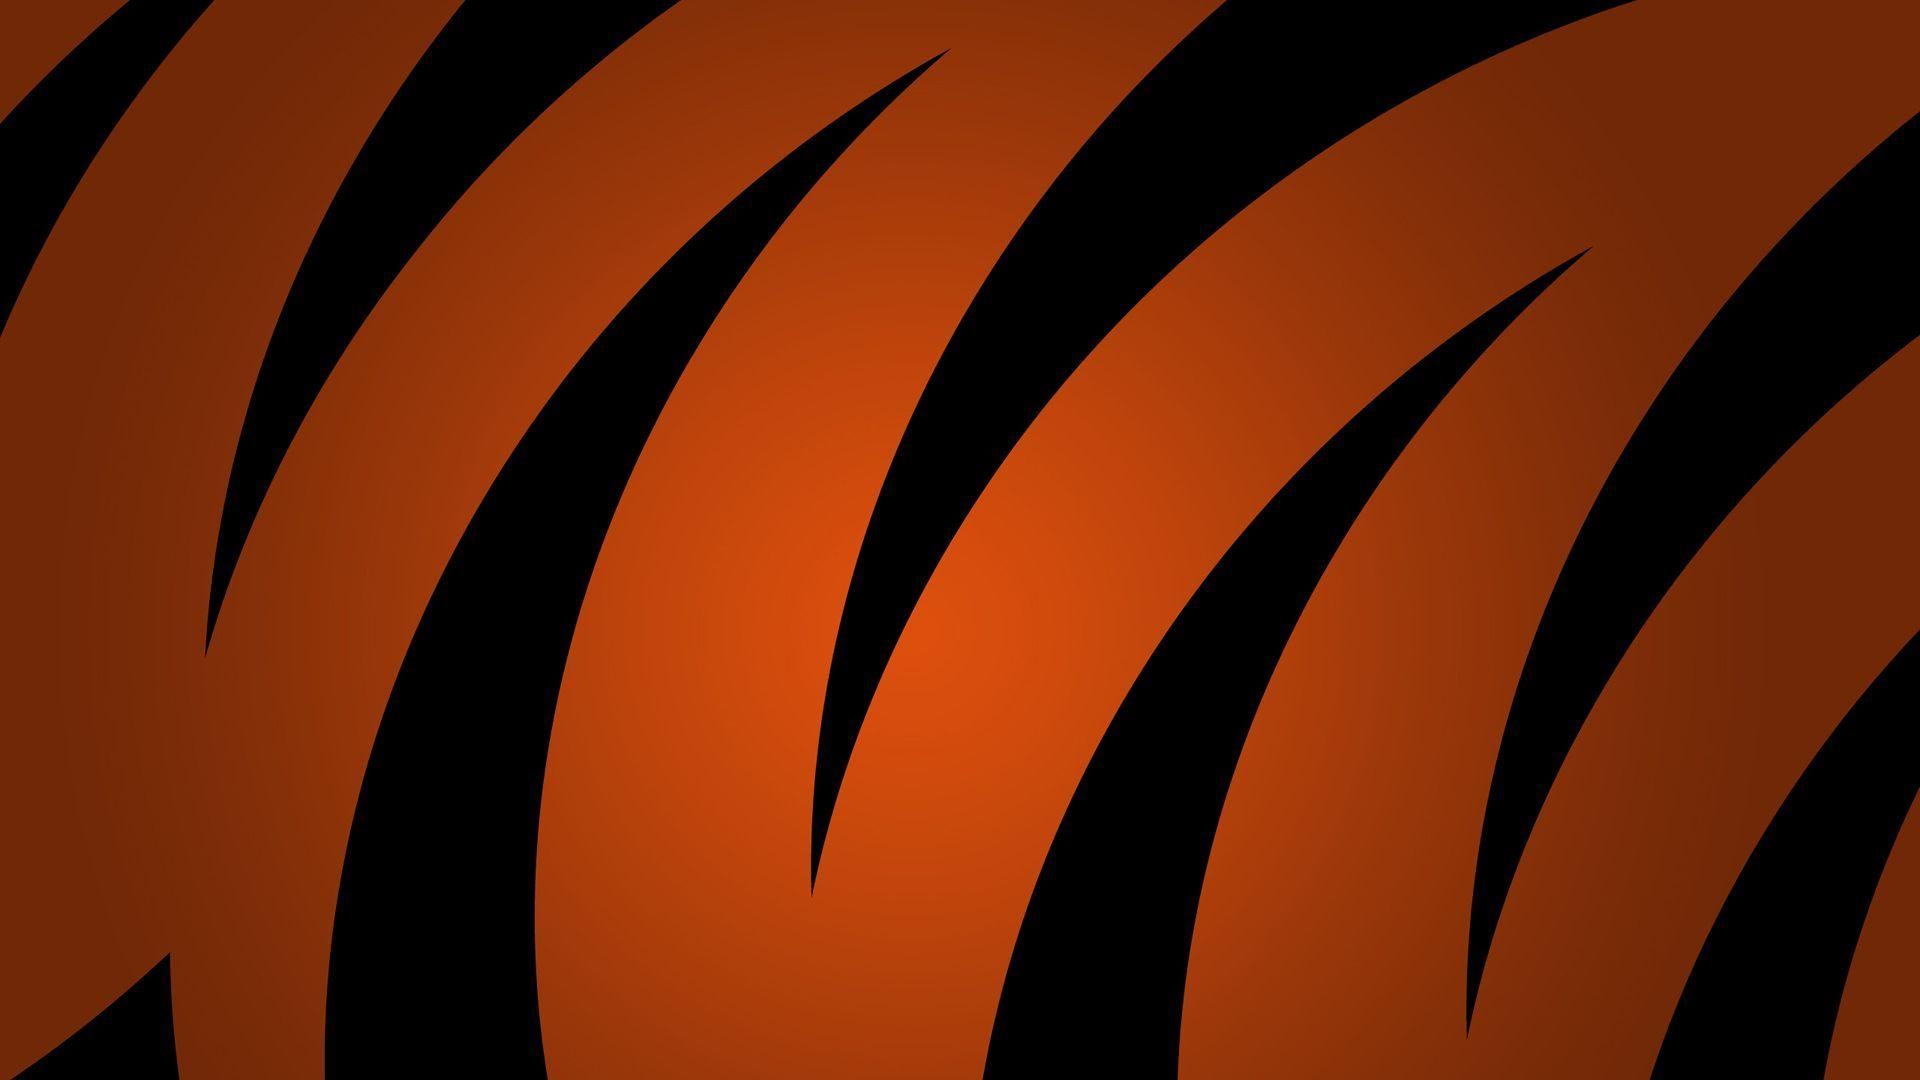 Orangethingmoar orange on black dark grey wallpaper high 1024768 orangethingmoar orange on black dark grey wallpaper high 1024768 orange black wallpaper 34 voltagebd Image collections